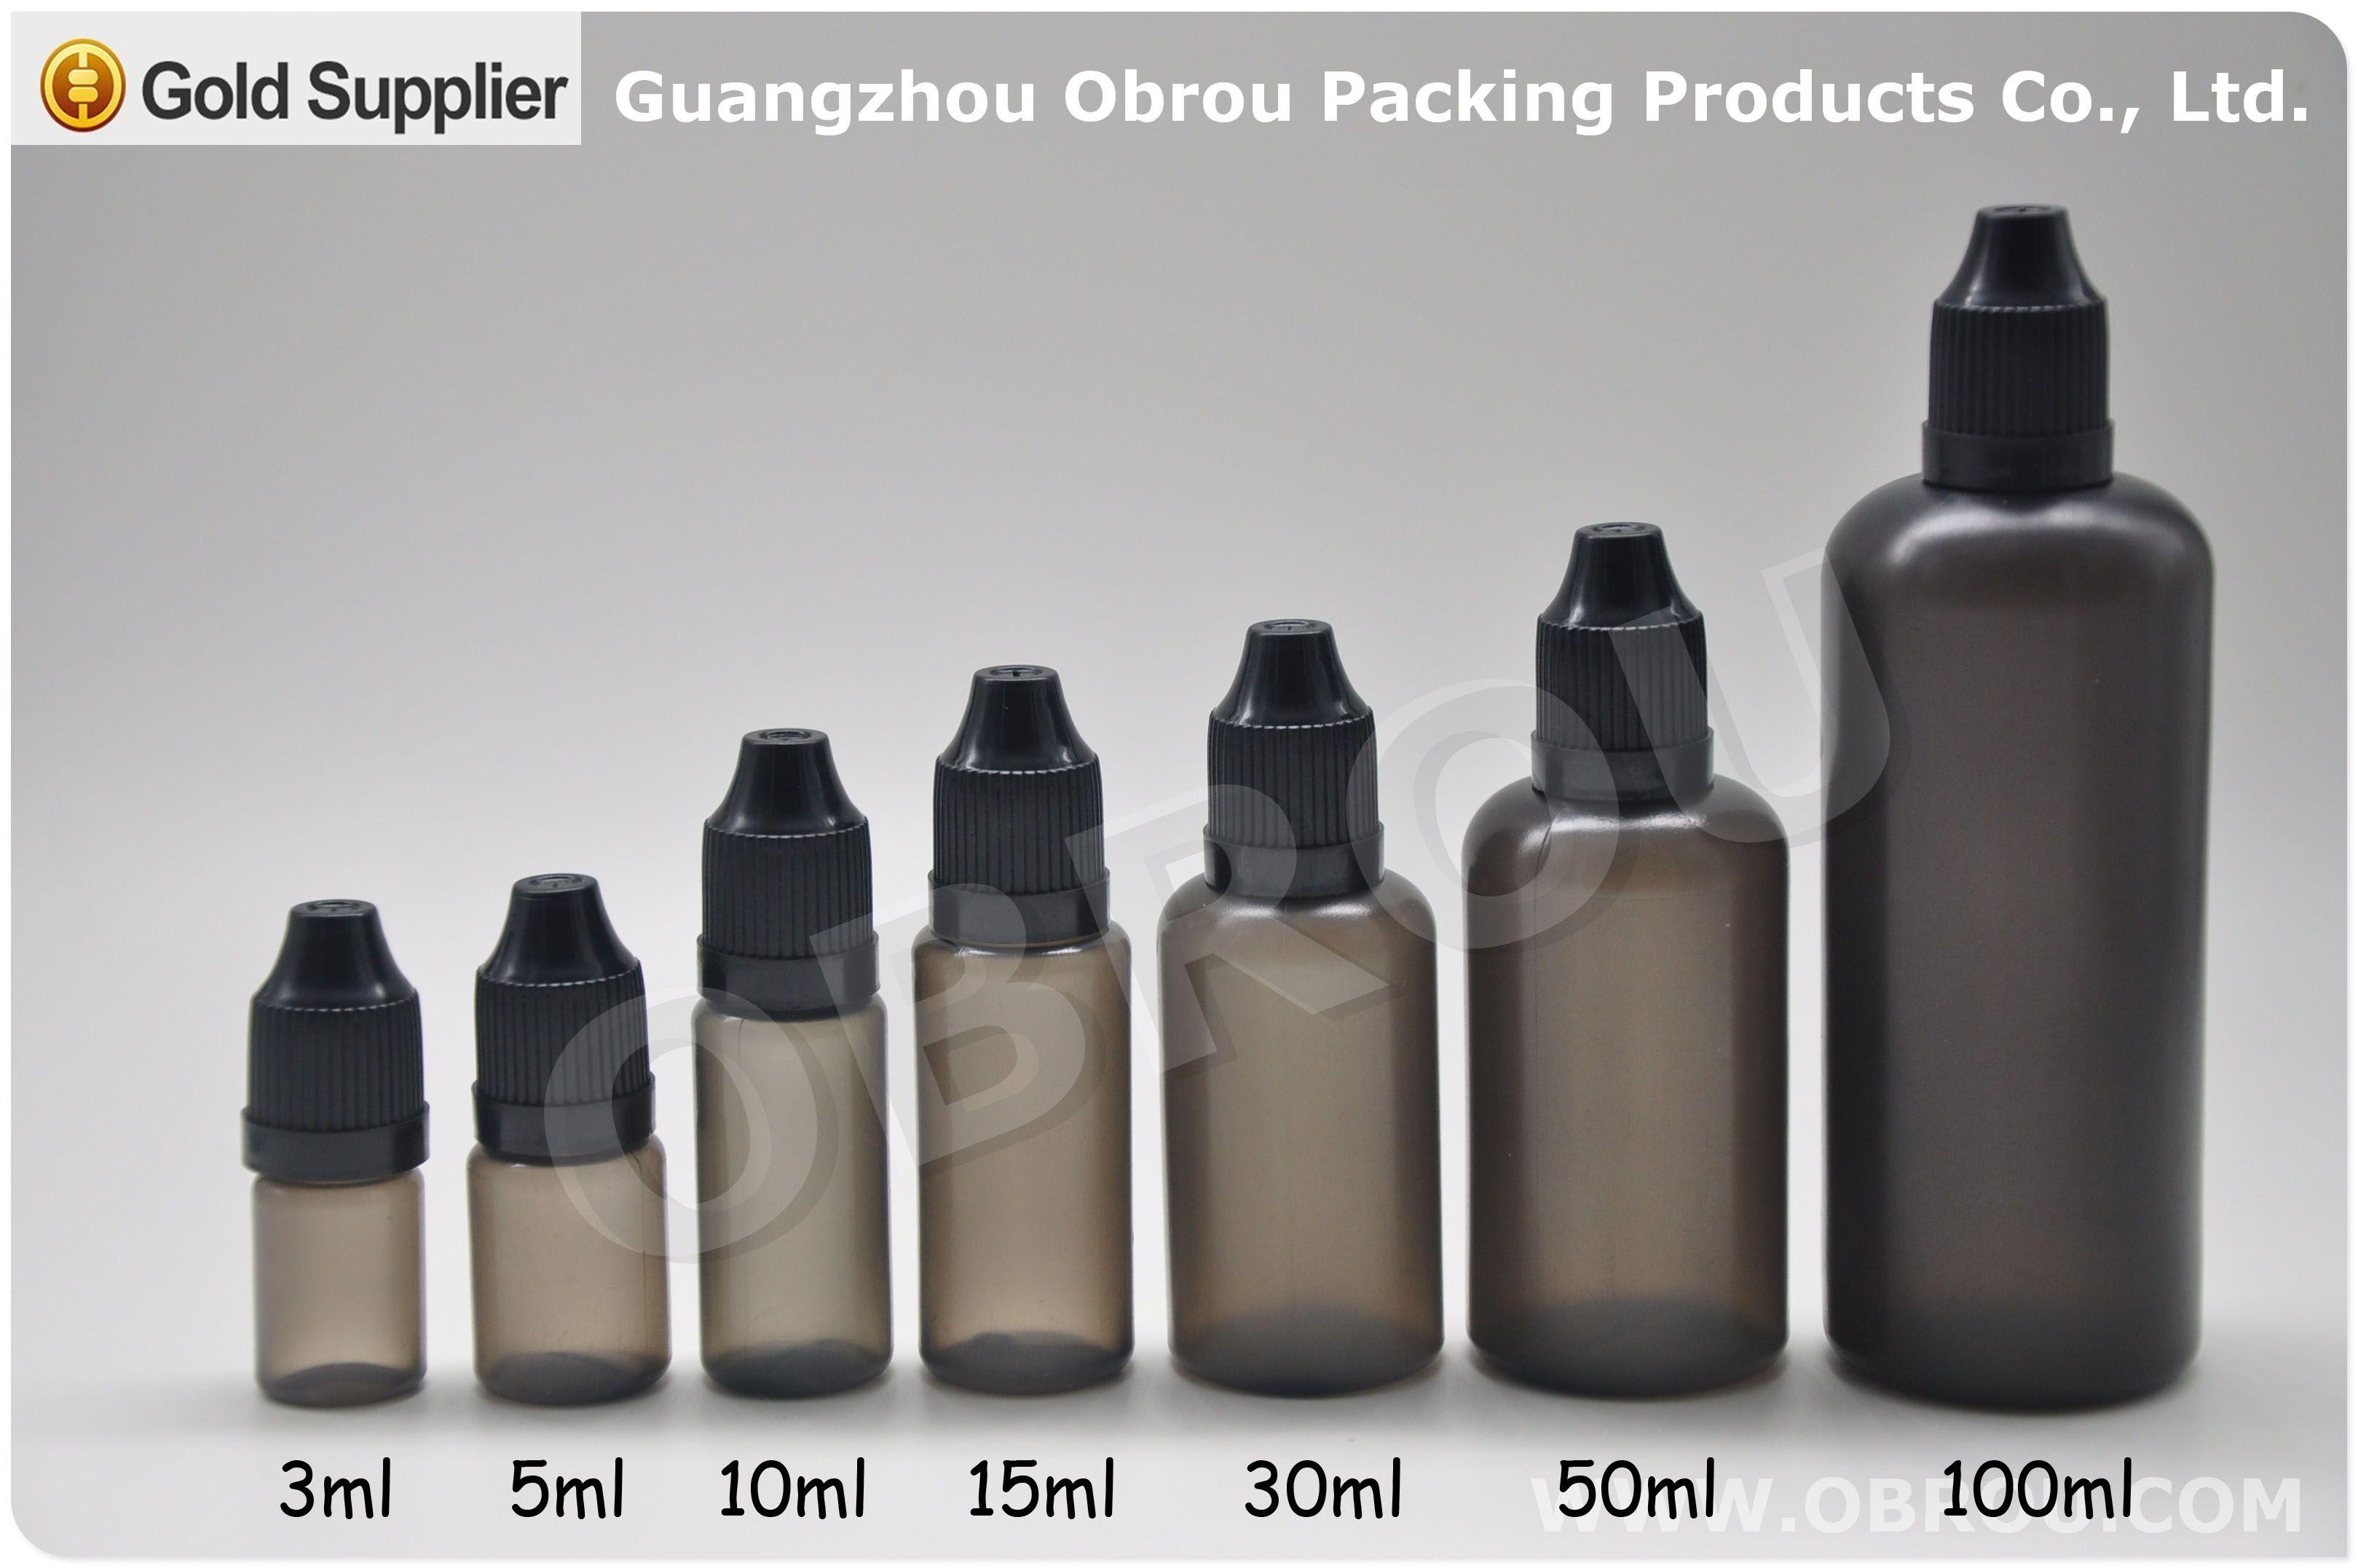 Hot Sale Pe Unicorn Bottle 5ml 10ml 15ml 30ml 50ml E Liquid Black Essential Oil Plastic Dropper Bottle With Childproof Ca Unicorn Bottle Bottle Dropper Bottles